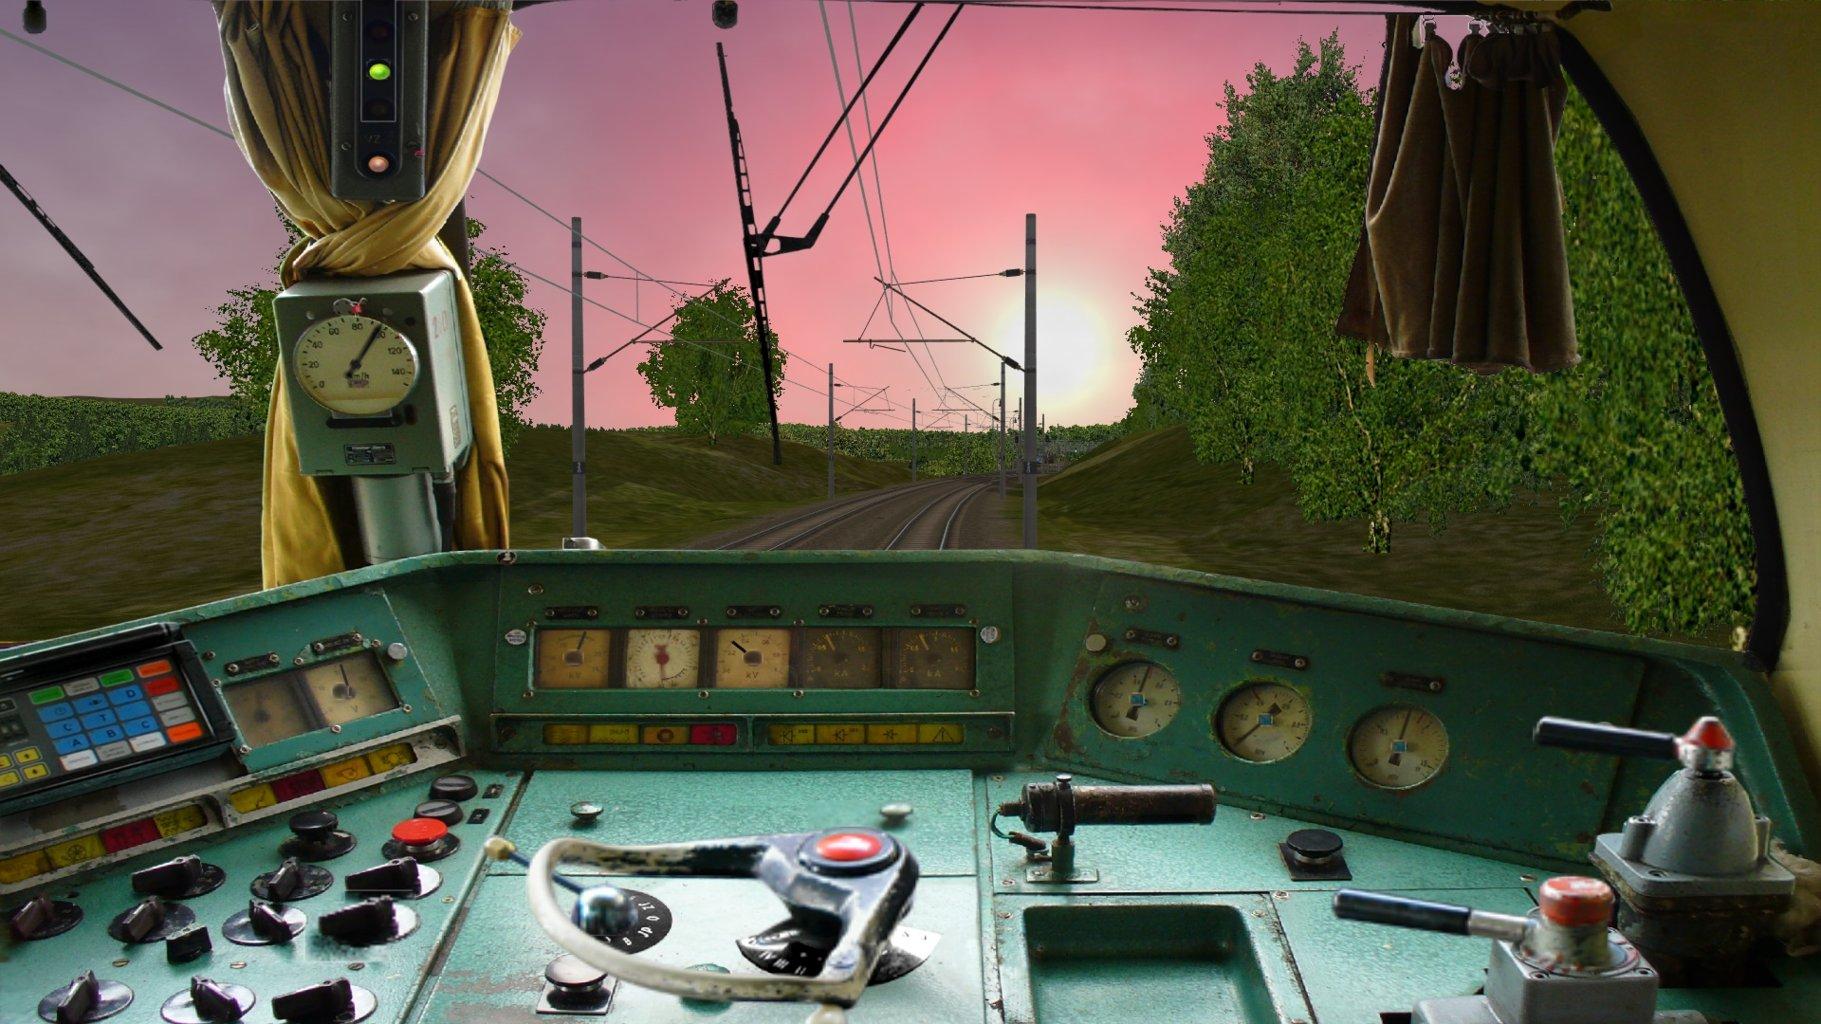 Open Rails 2021-04-06 08-47-28.jpg